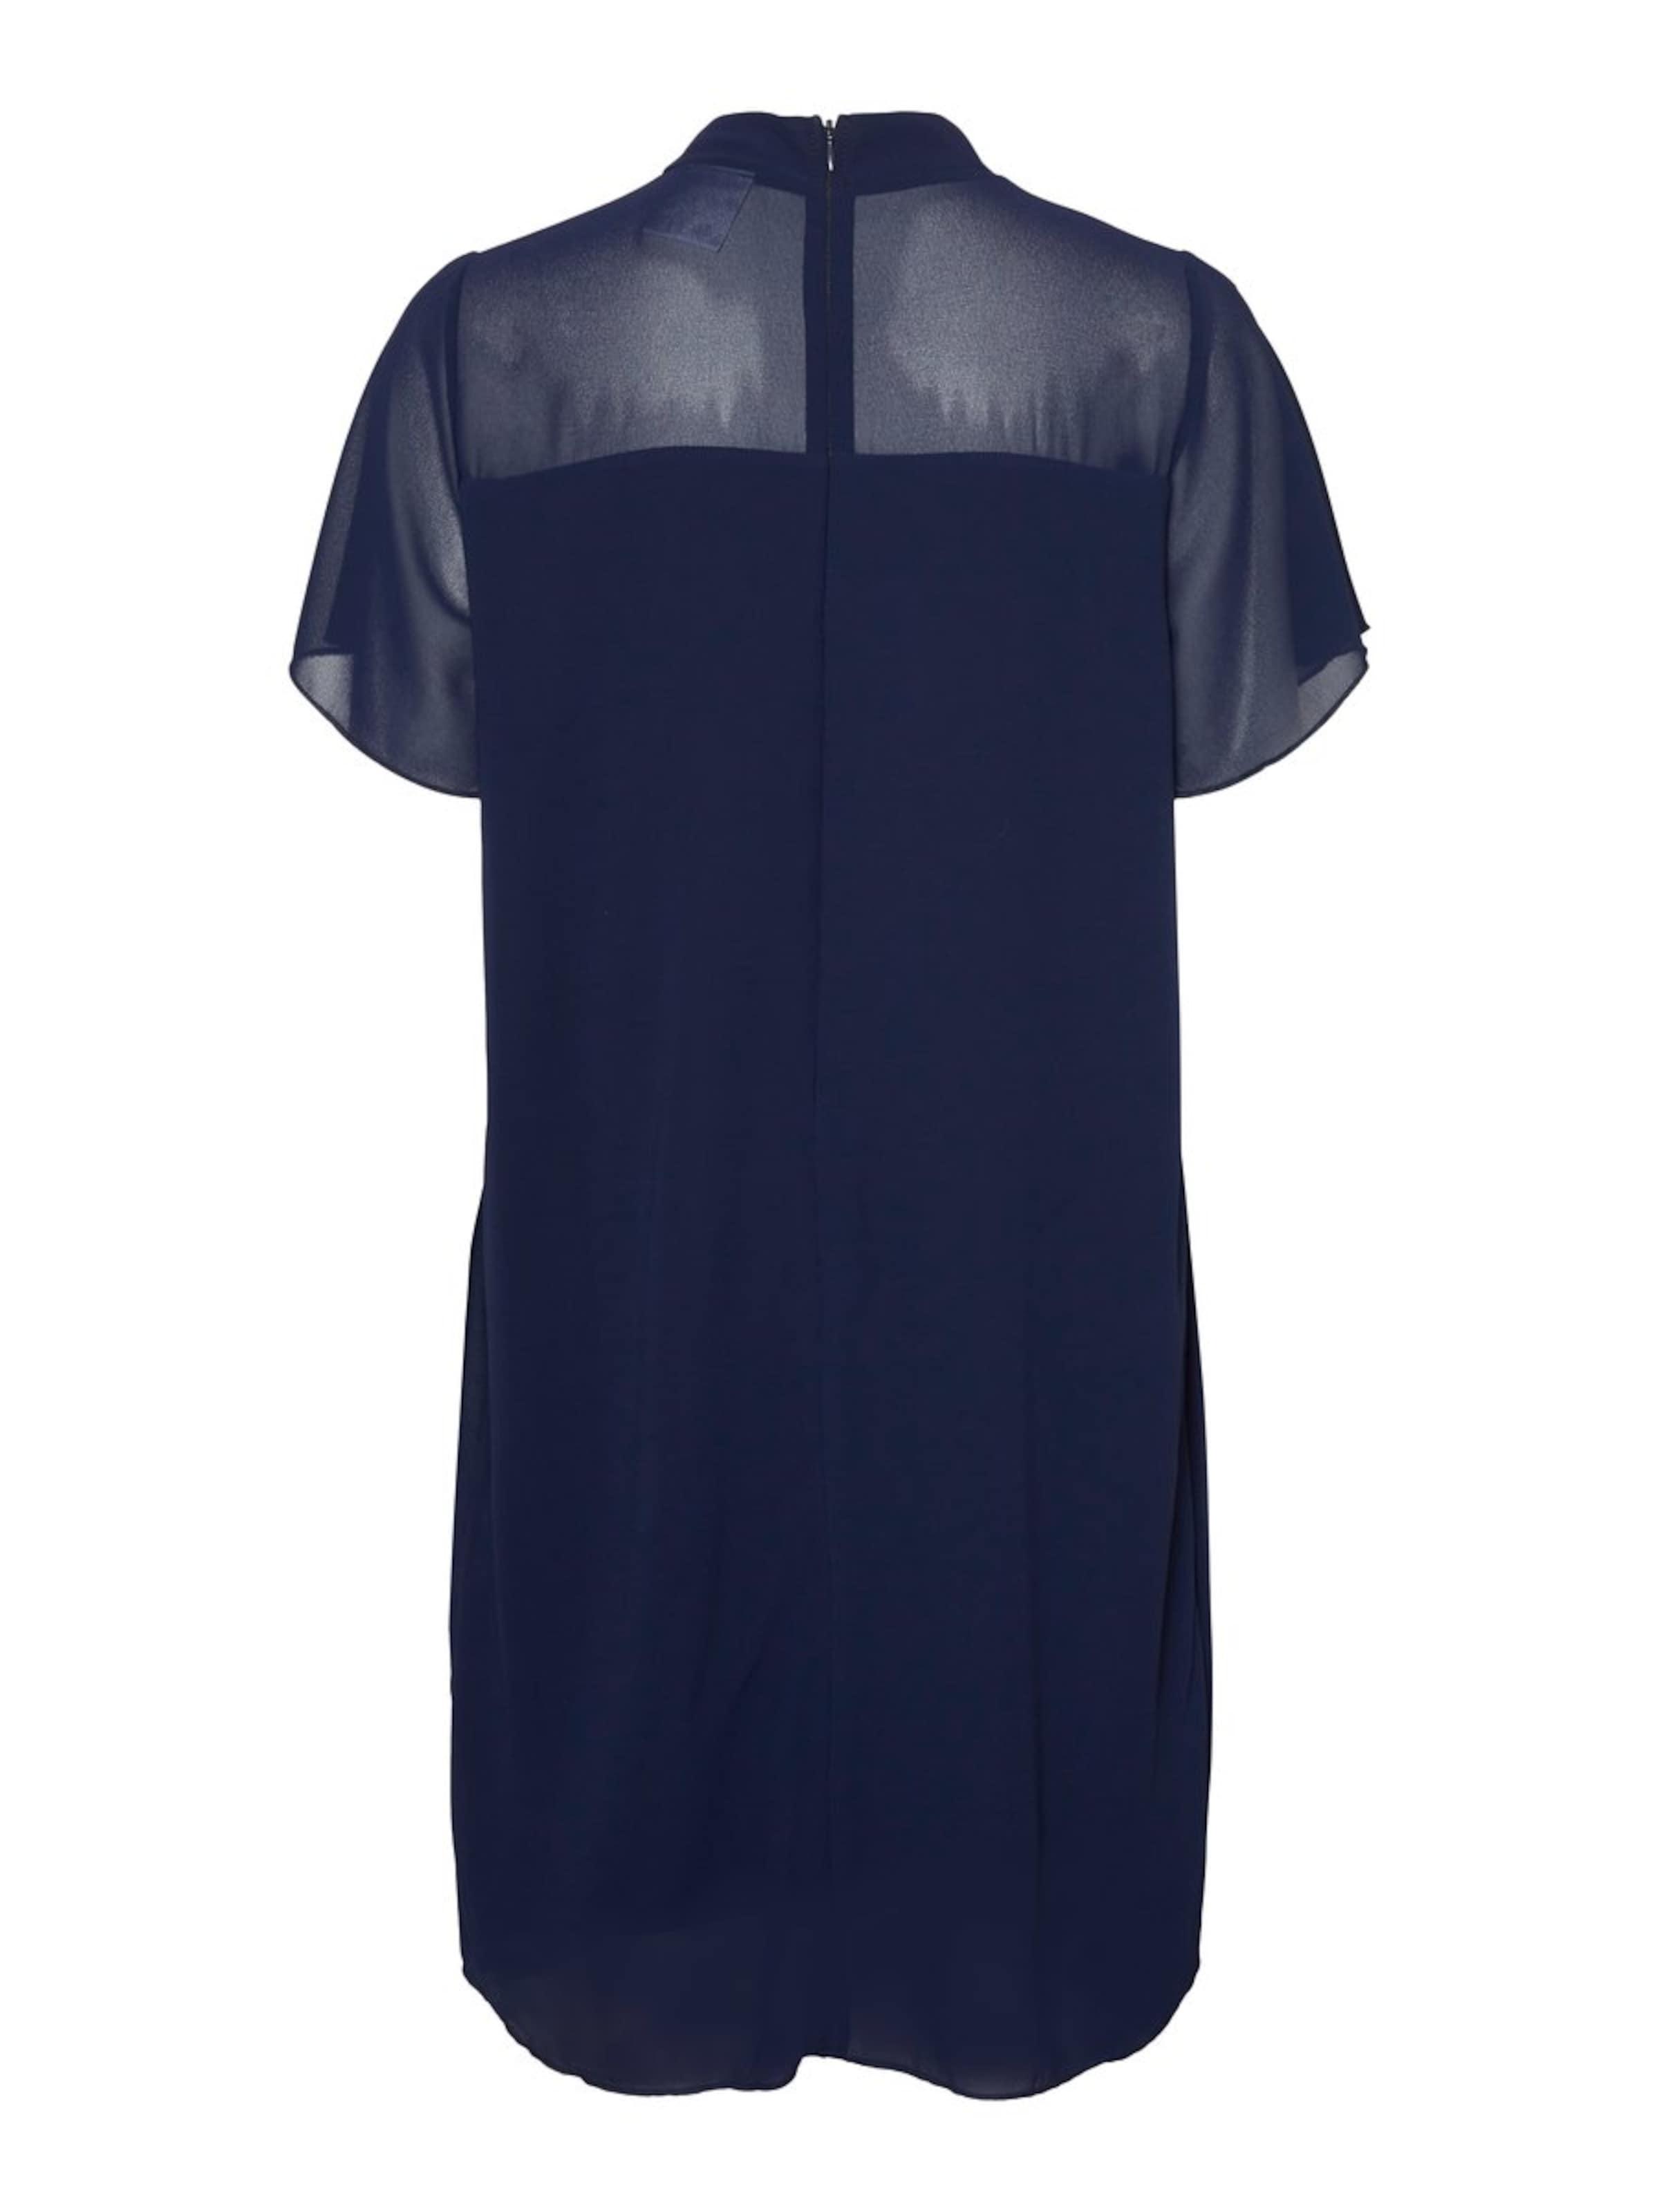 En Bleu Mamalicious Robe Mamalicious Mamalicious Robe En Marine Marine Bleu Robe 8OkwP0XnN